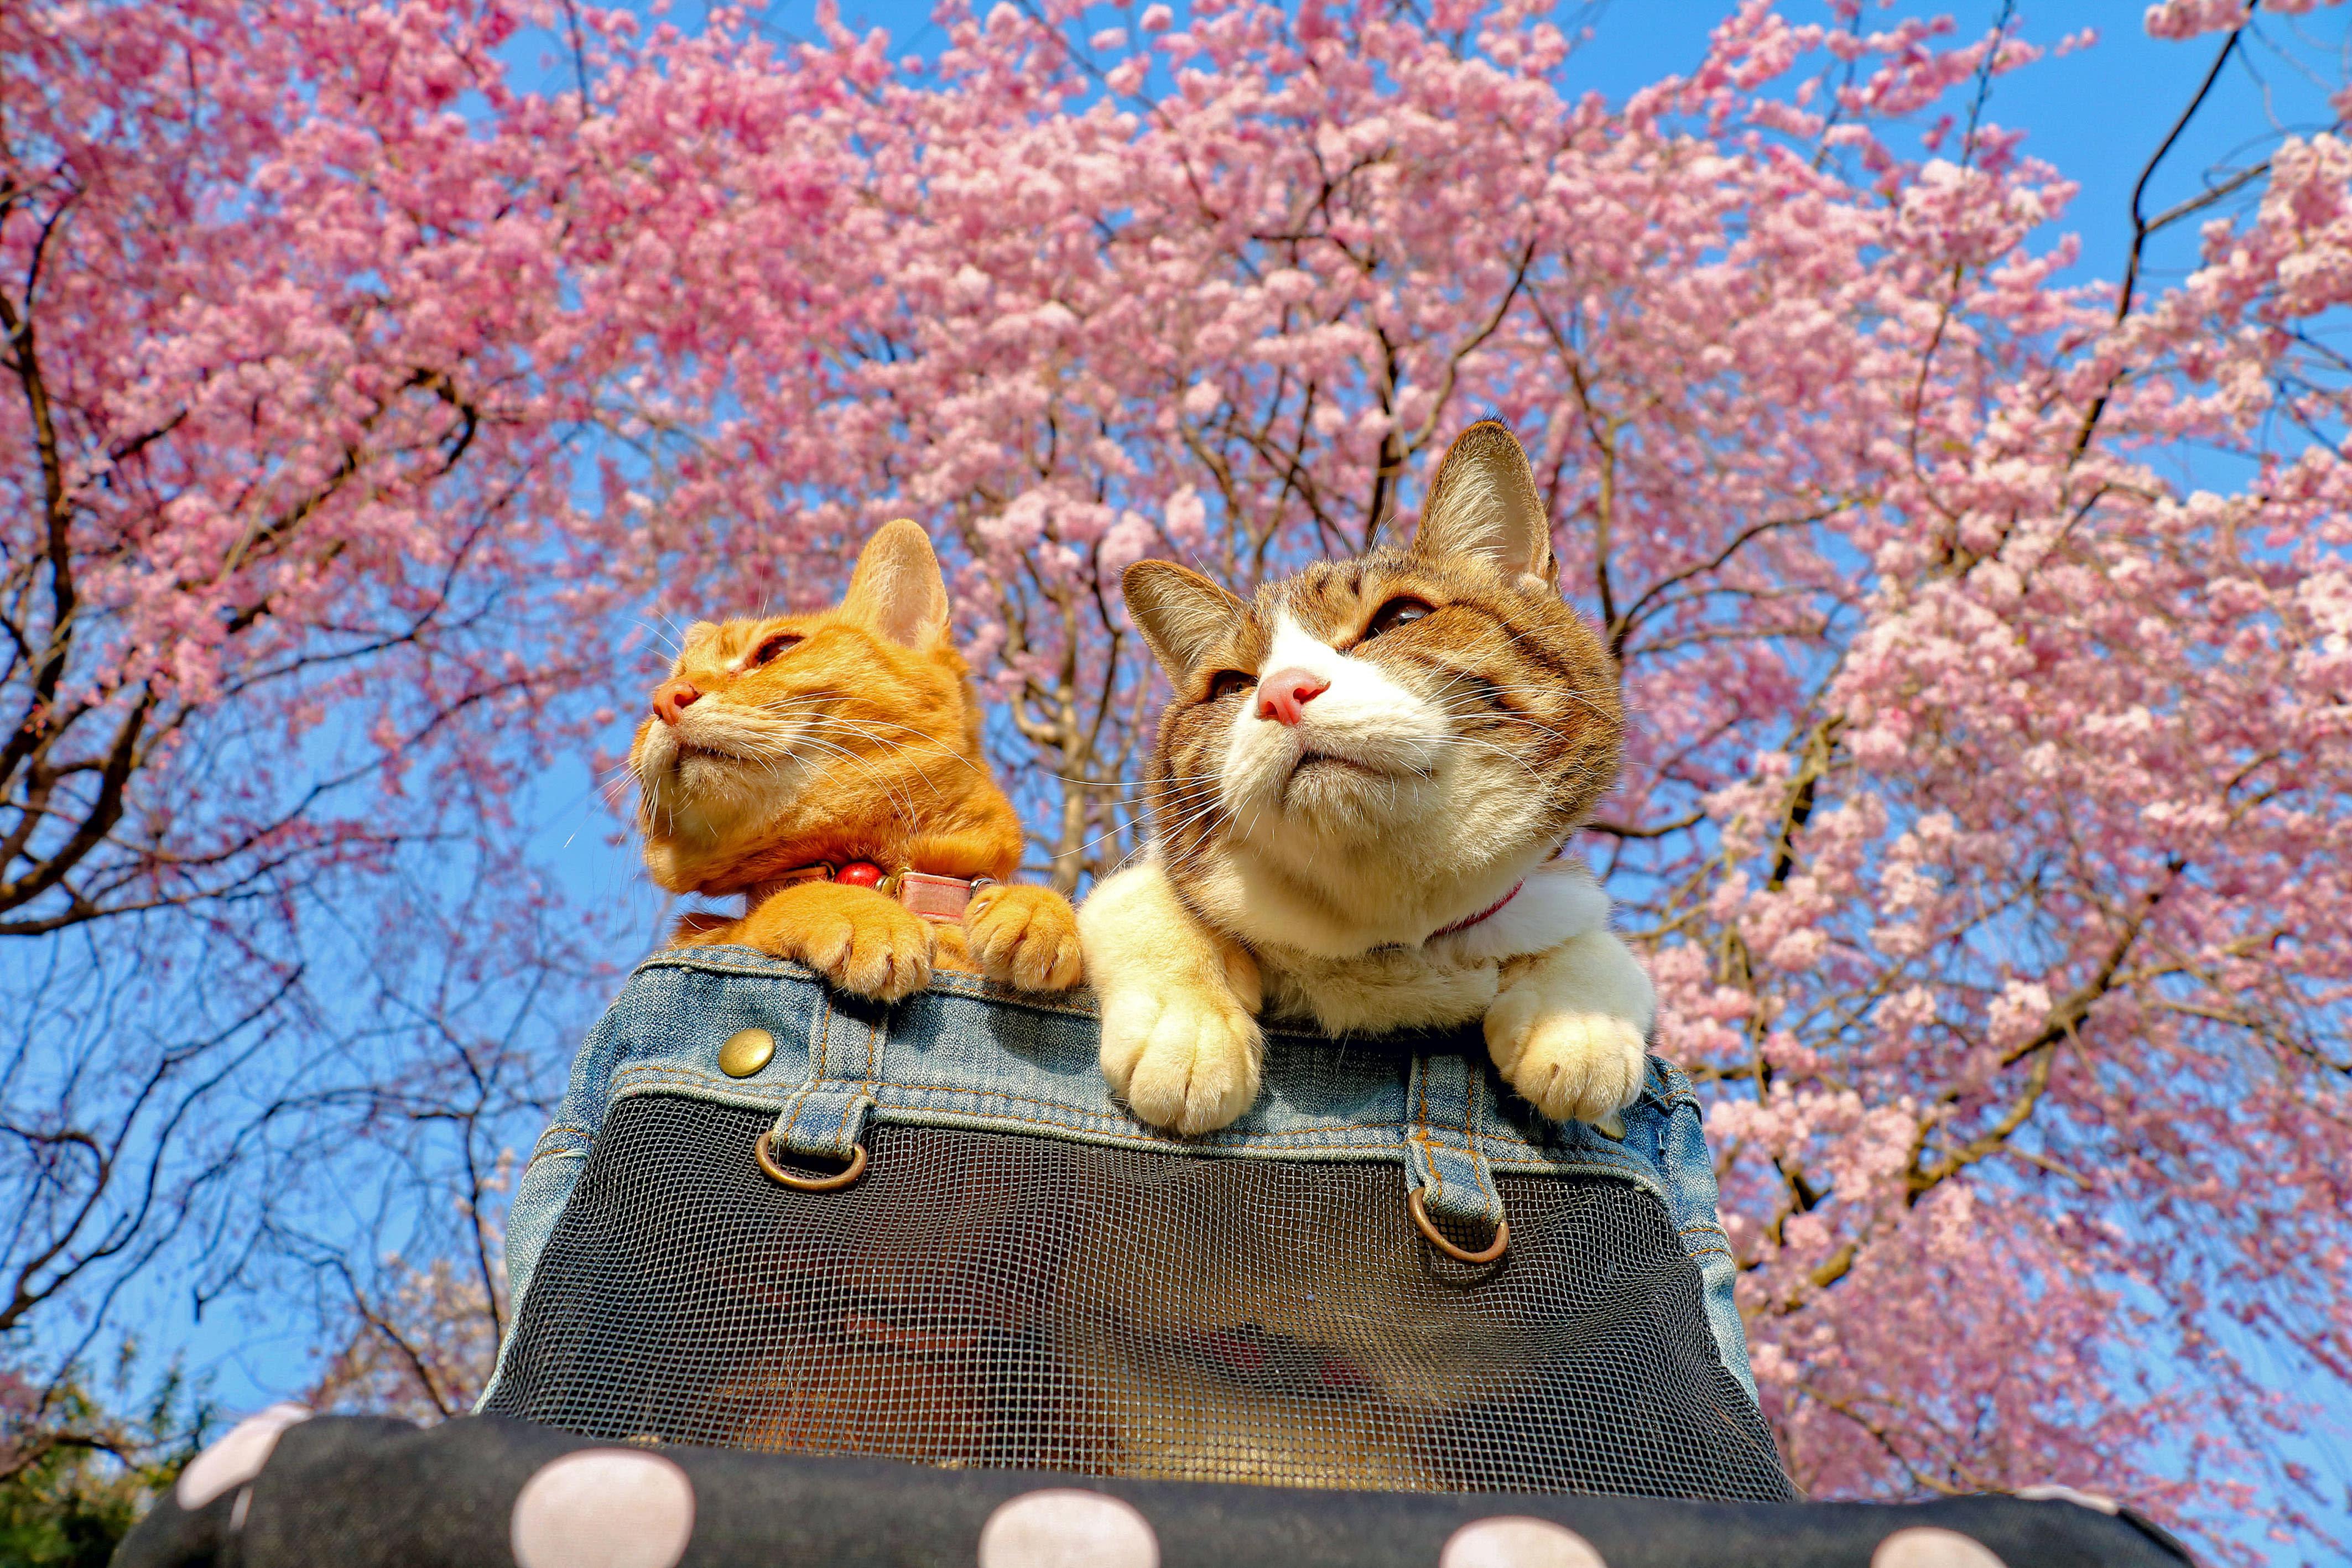 <p>Daisuke Nagasawa travels nationally and internationally with his cats, Fuku-Chan and Daikichi. Here, the two pose under the iconic Japanese cherry blossoms. (Photo: Daisuke Nagasawa/Caters News) </p>